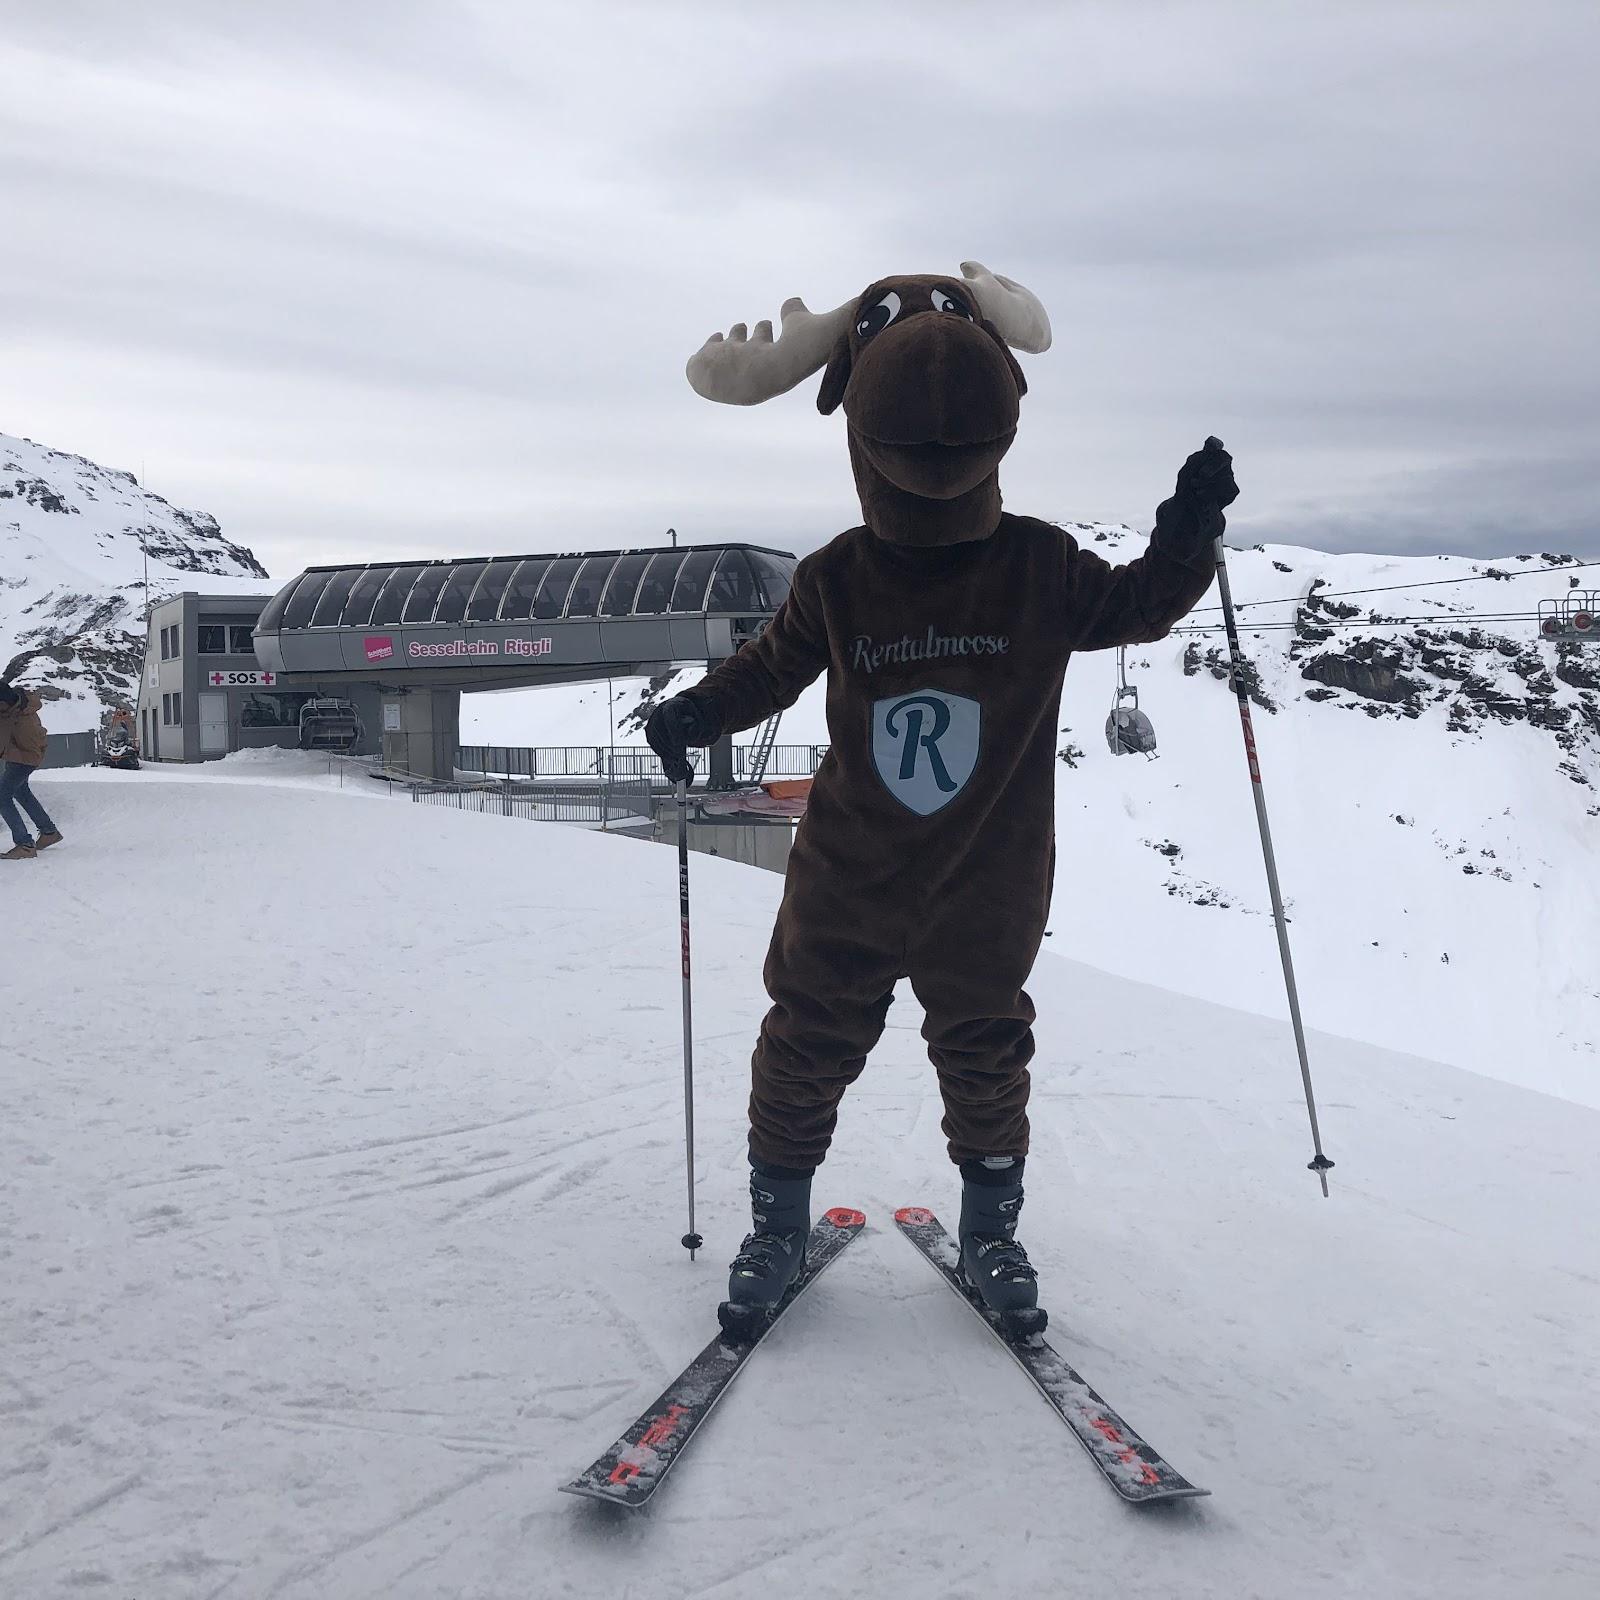 Rental Moose mascot posing on ski slope in Switzerland. Rental Moose is a global car rental broker.